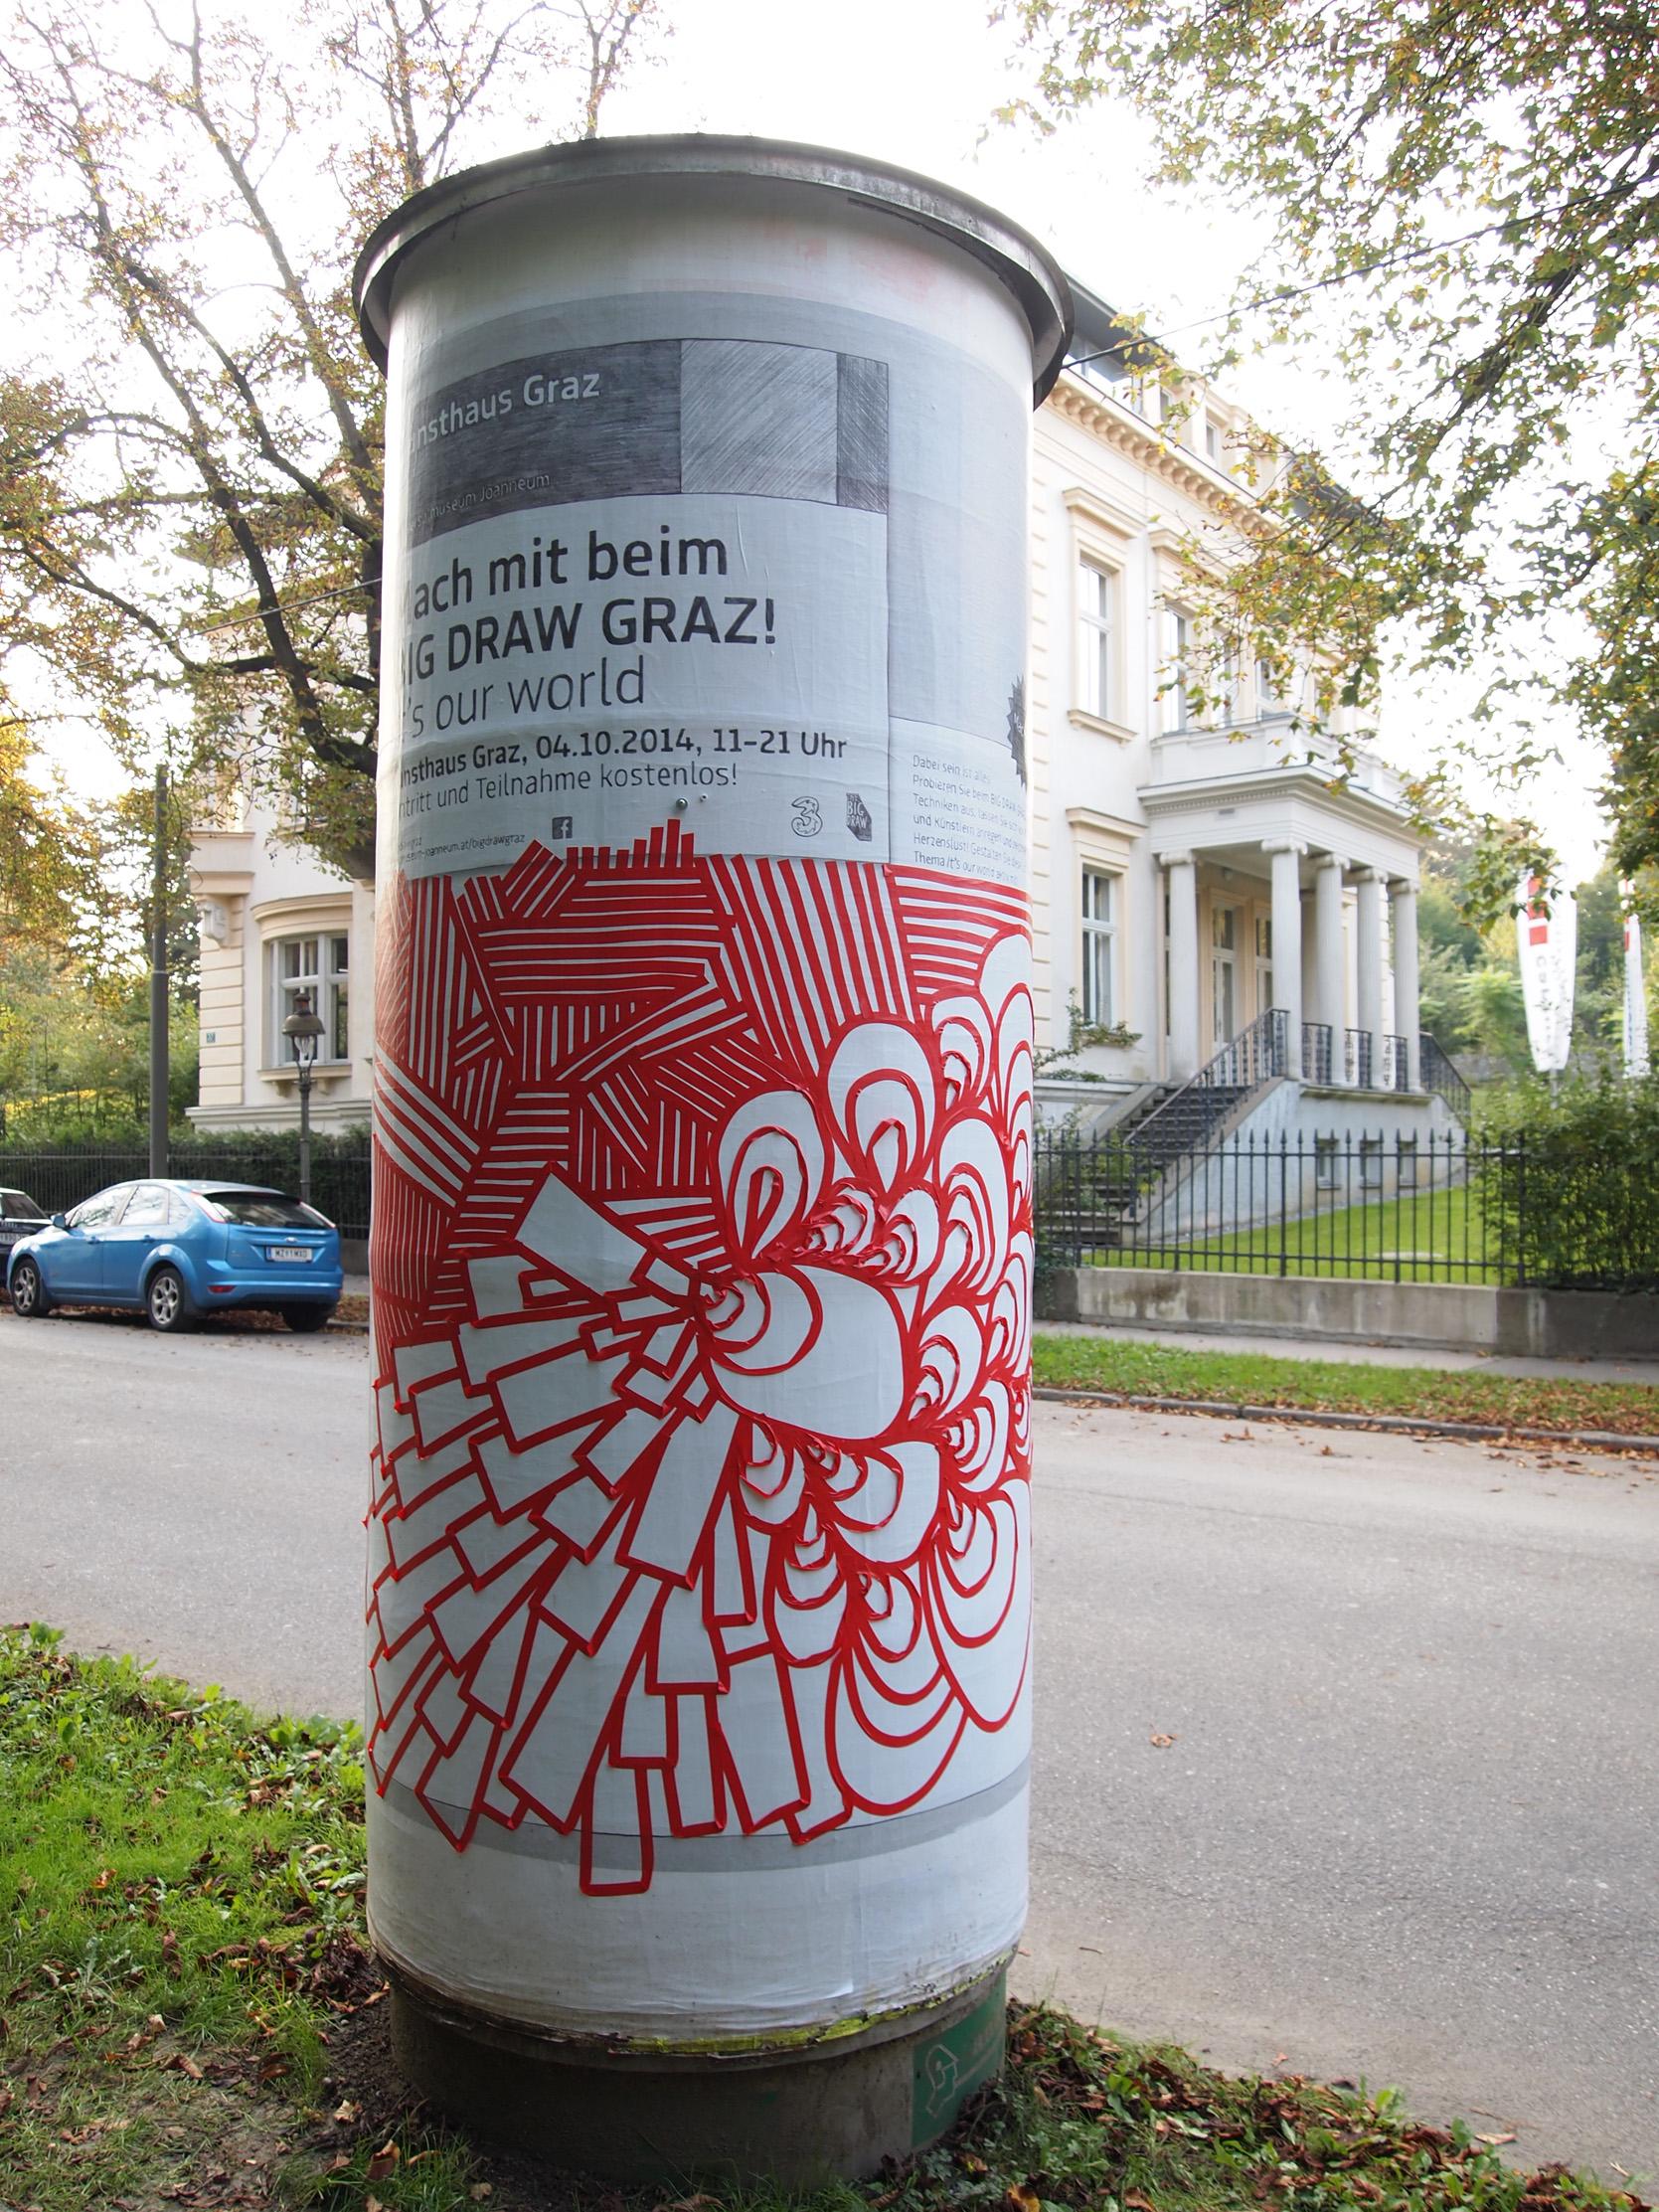 Litfaßsäule in der Schubertstraße, © UMJ